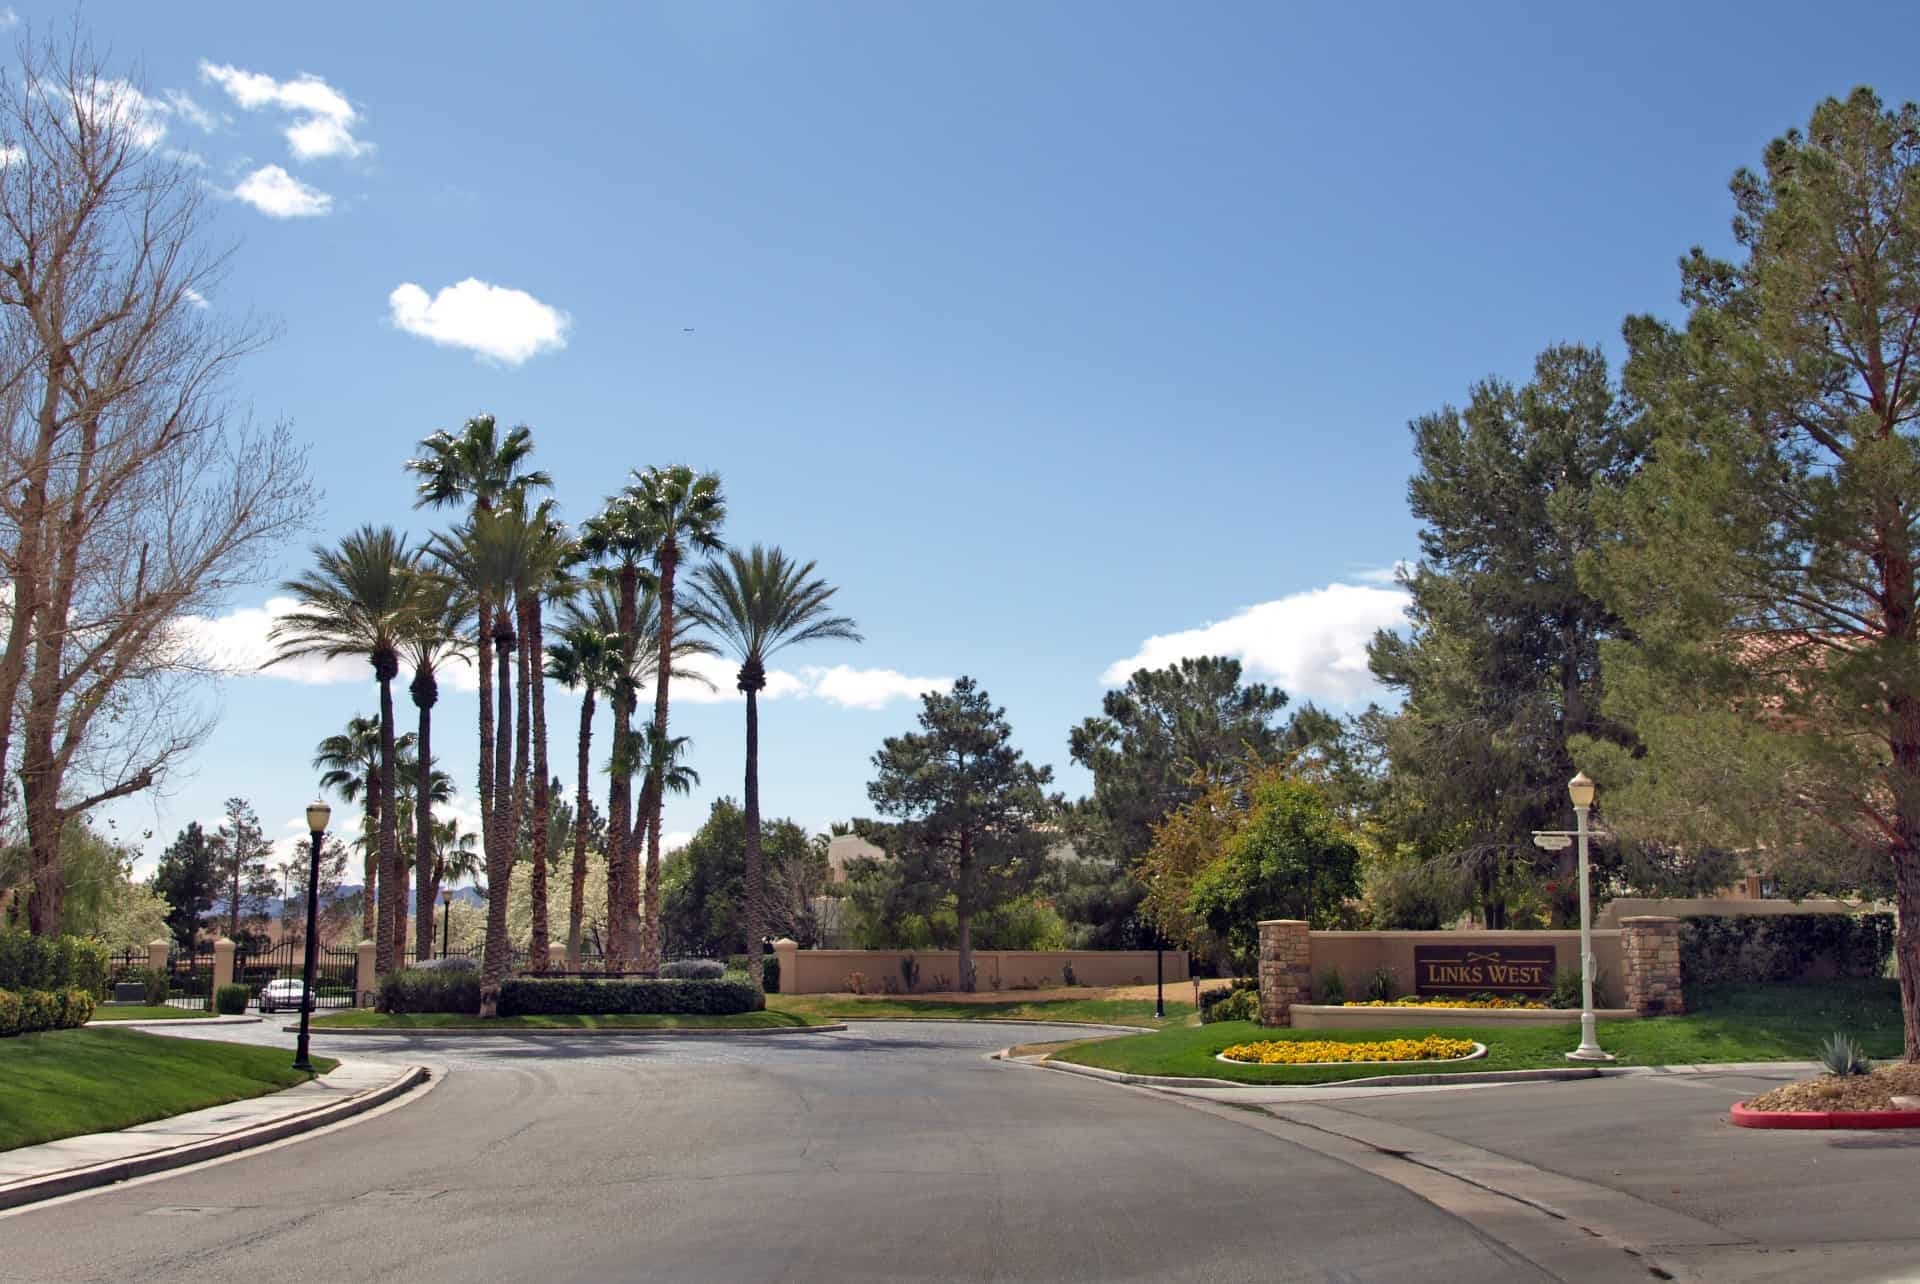 spanish-trail-rob-jensen-company-guard-gated-real-estate-summerlin-las-vegas-henderson-10